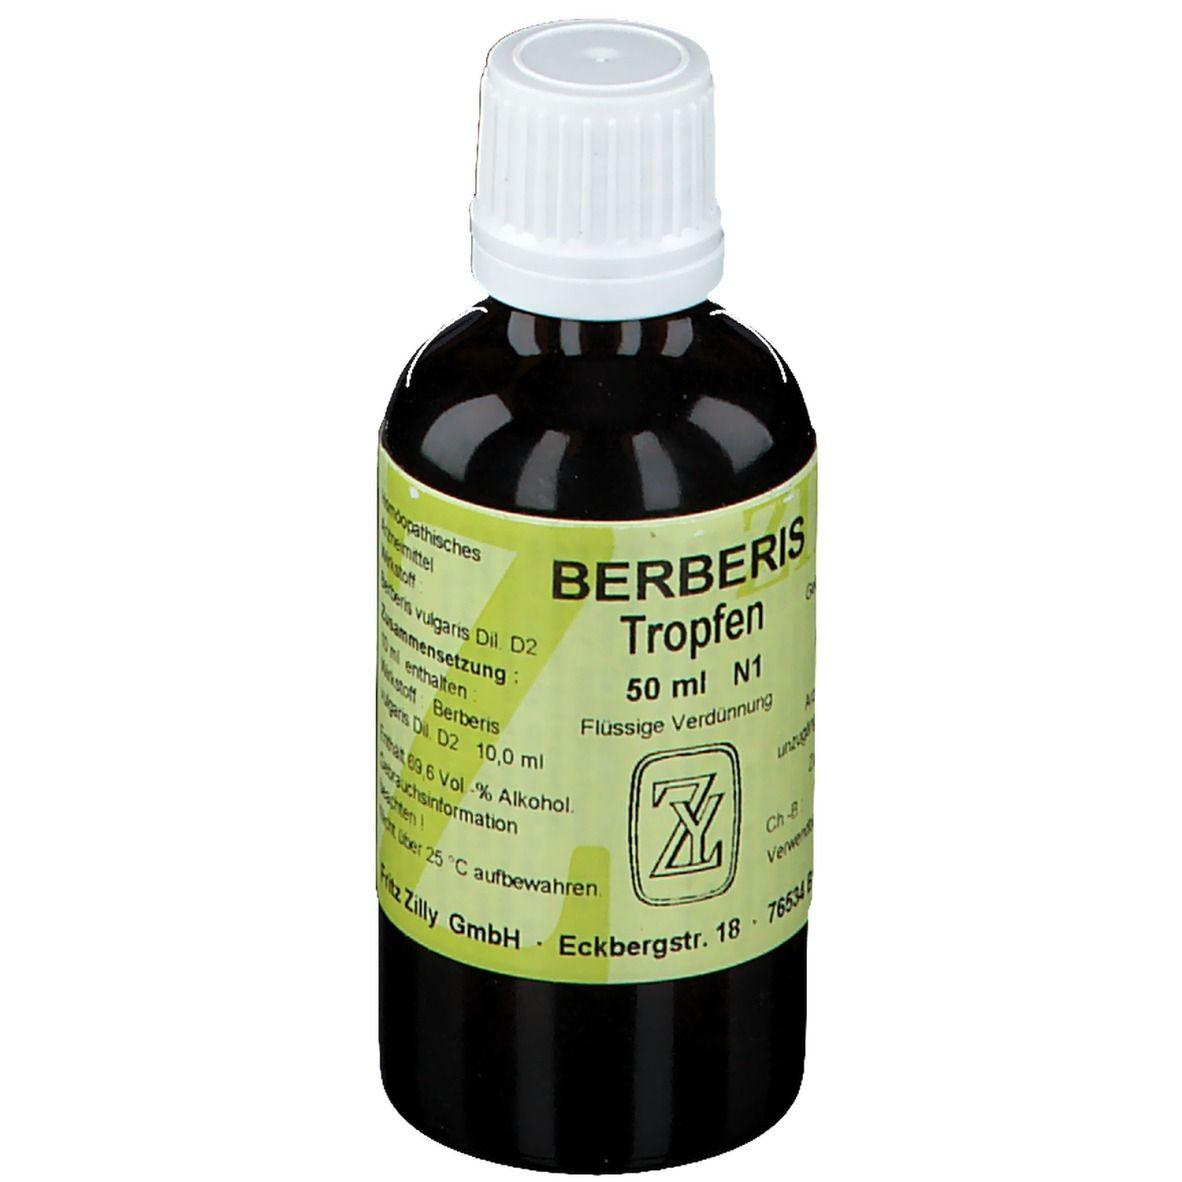 Berberis Tropfen